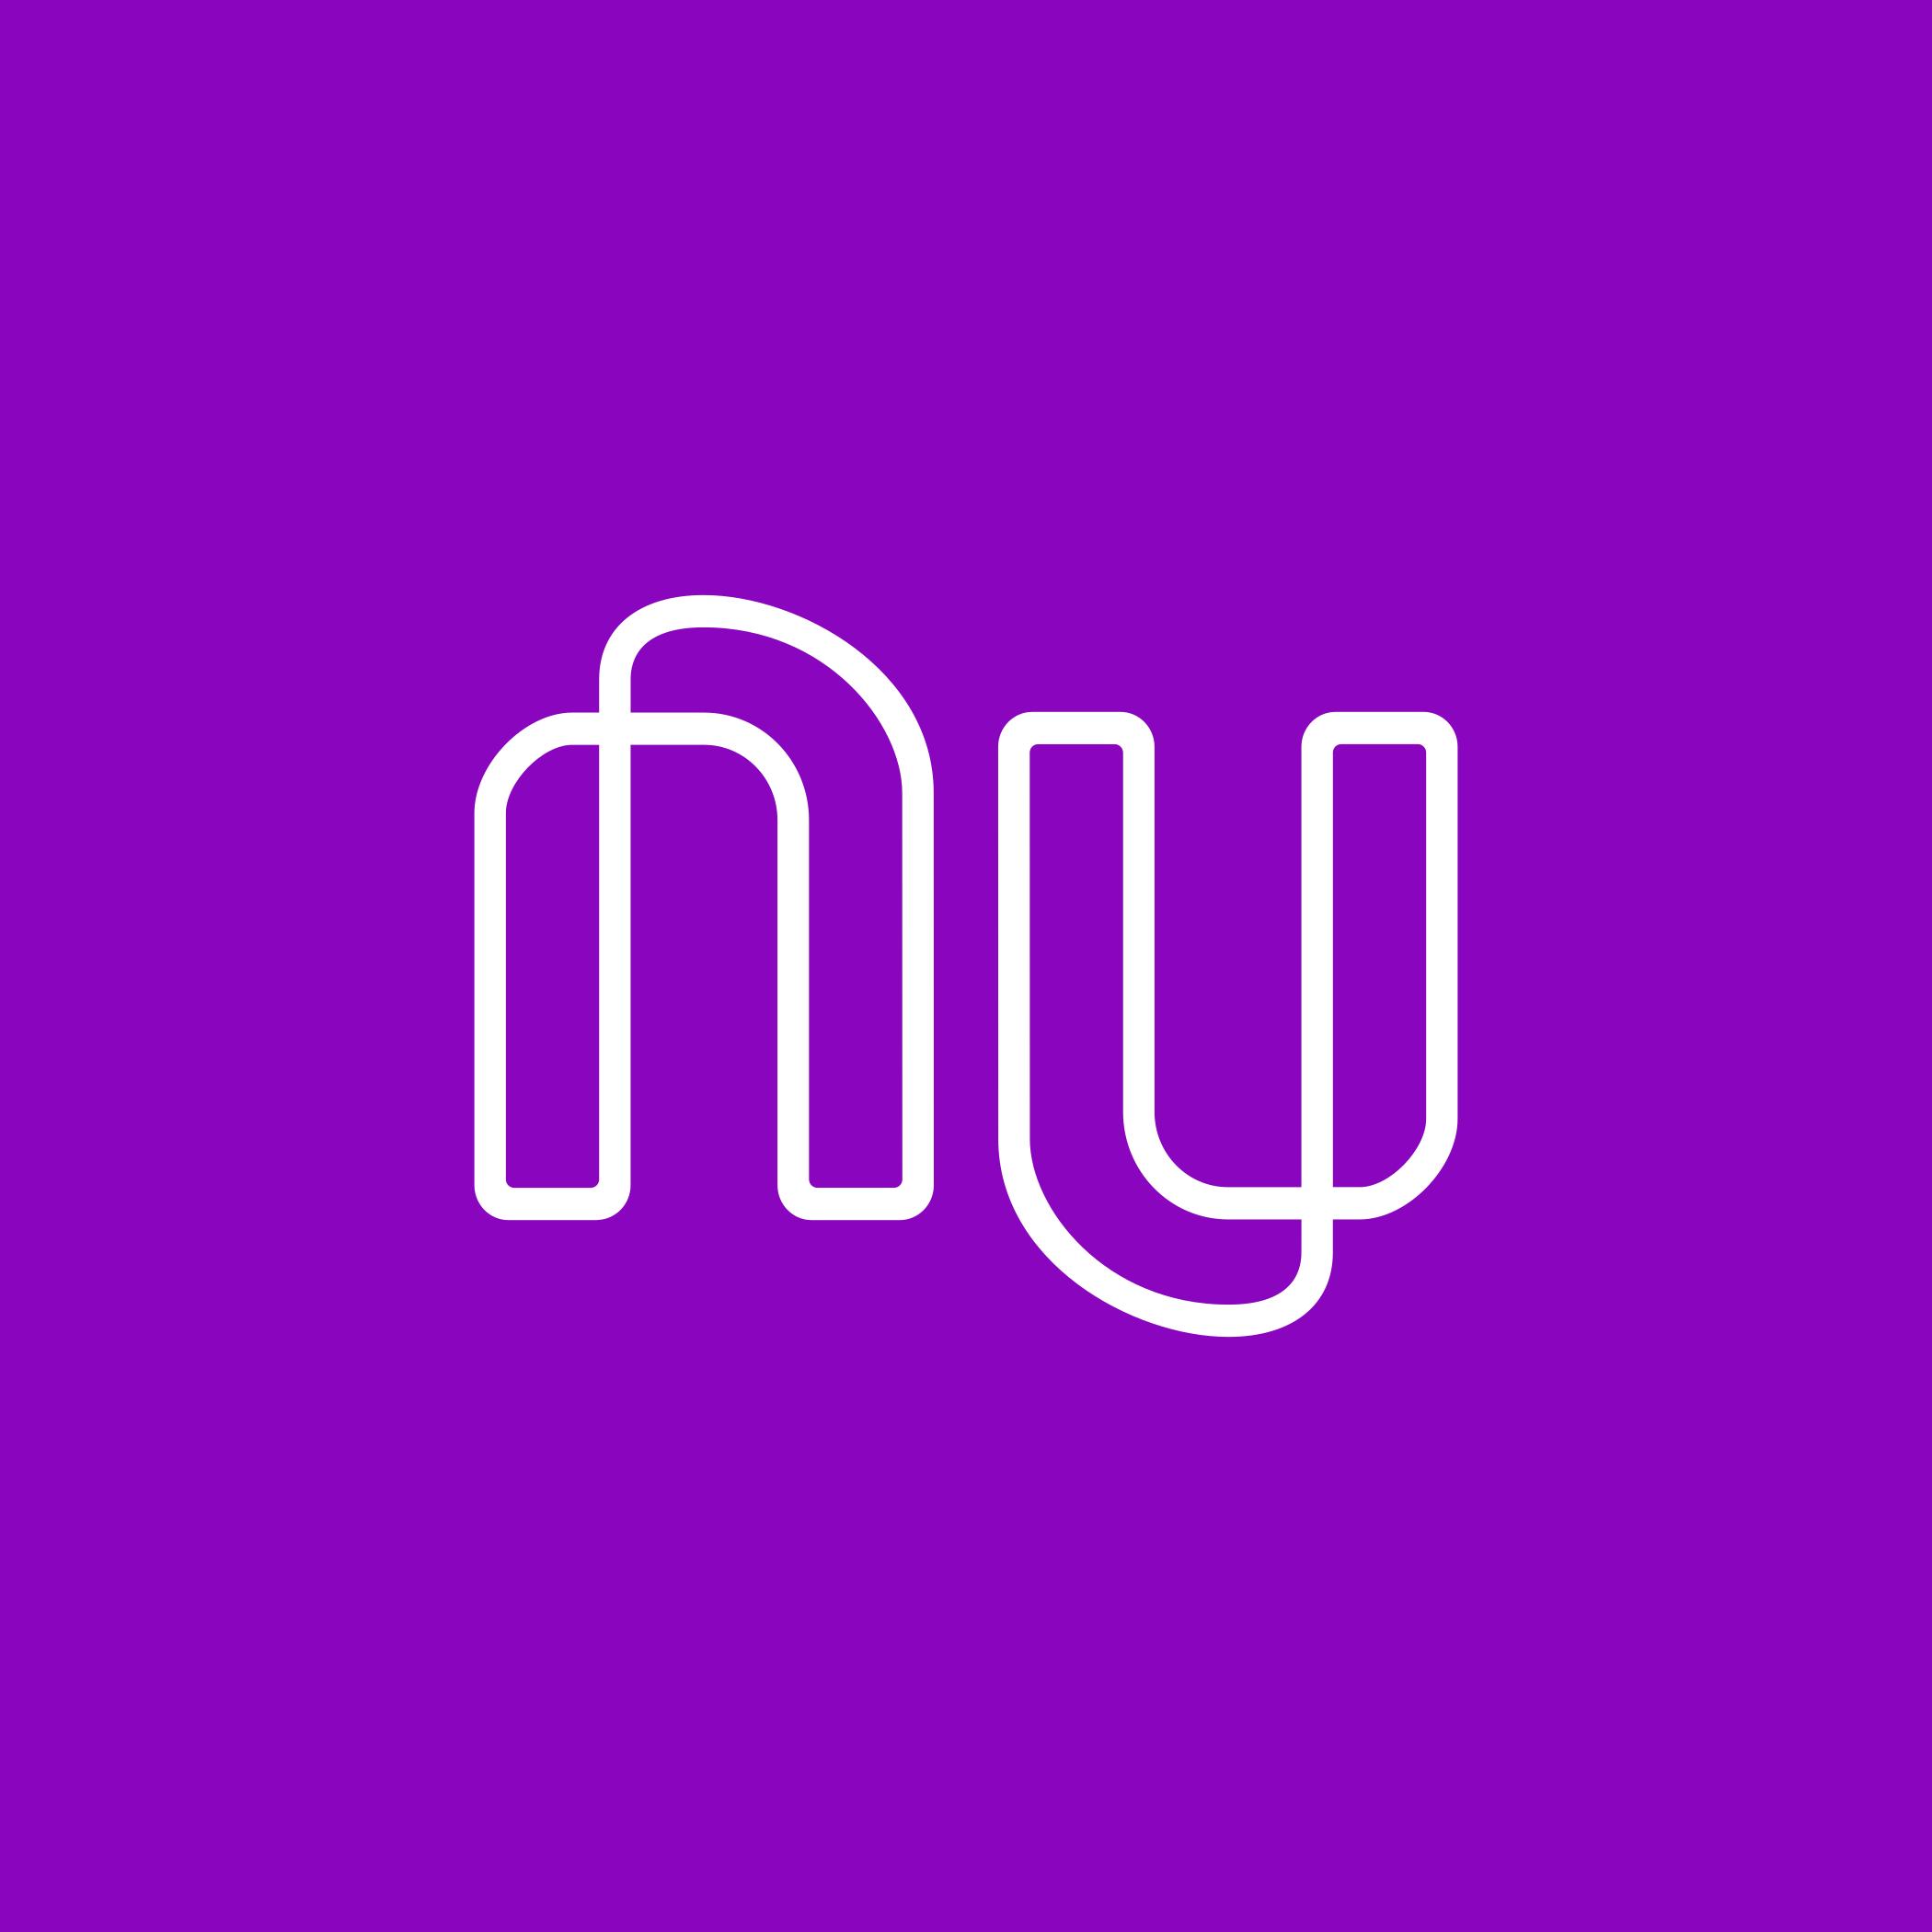 nubank logo 6 - Nubank Logo